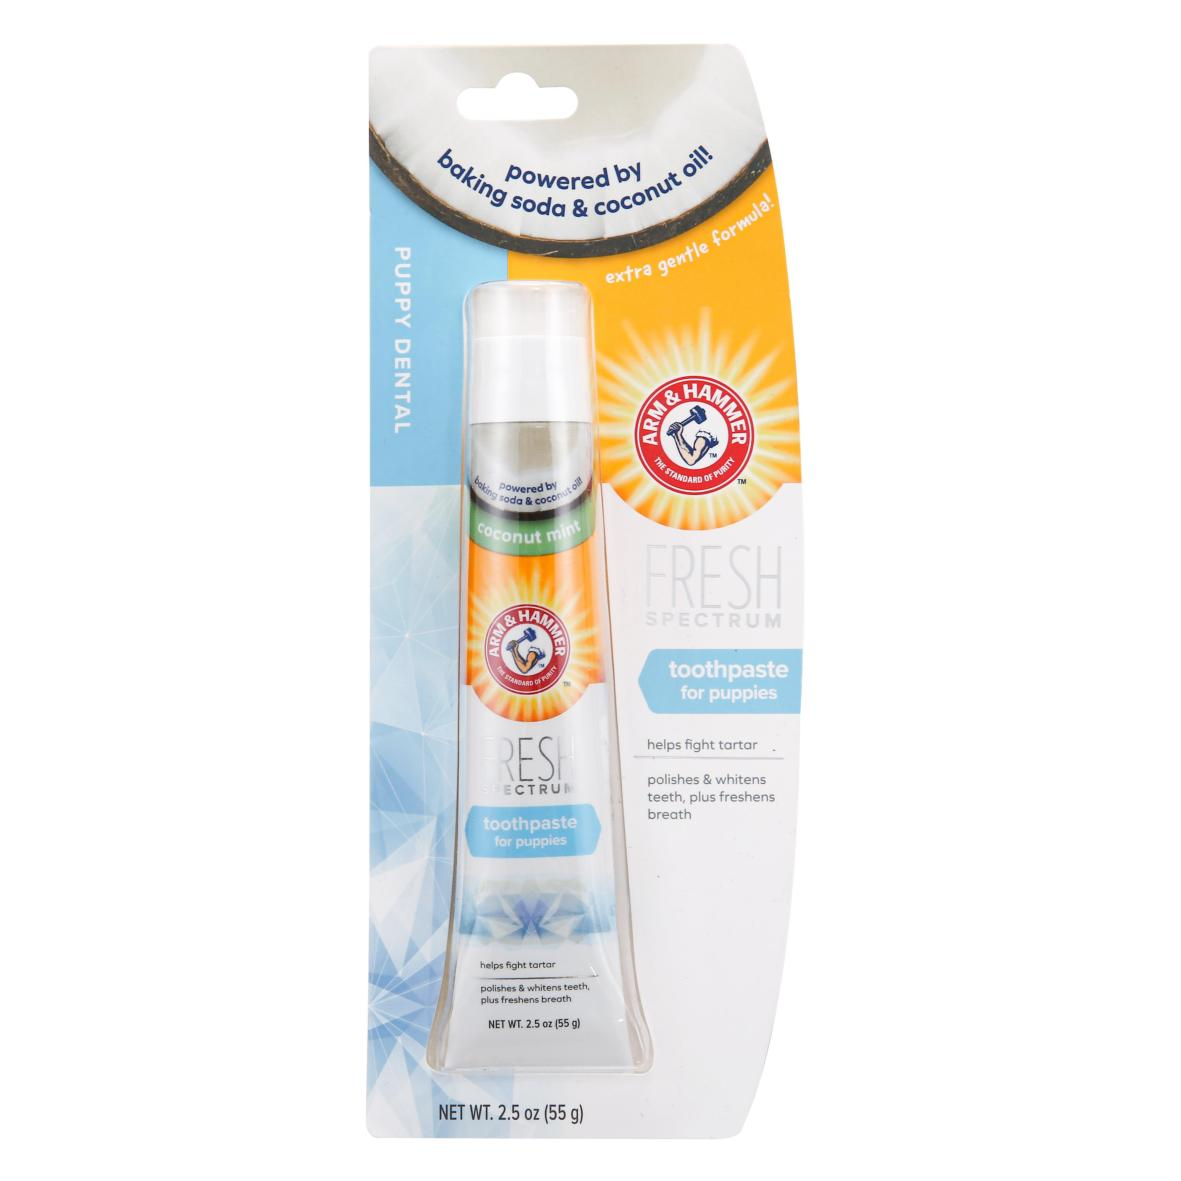 Arm & Hammer Puppy Dental Toothpaste 55gm (Coconut Mint Flavour)